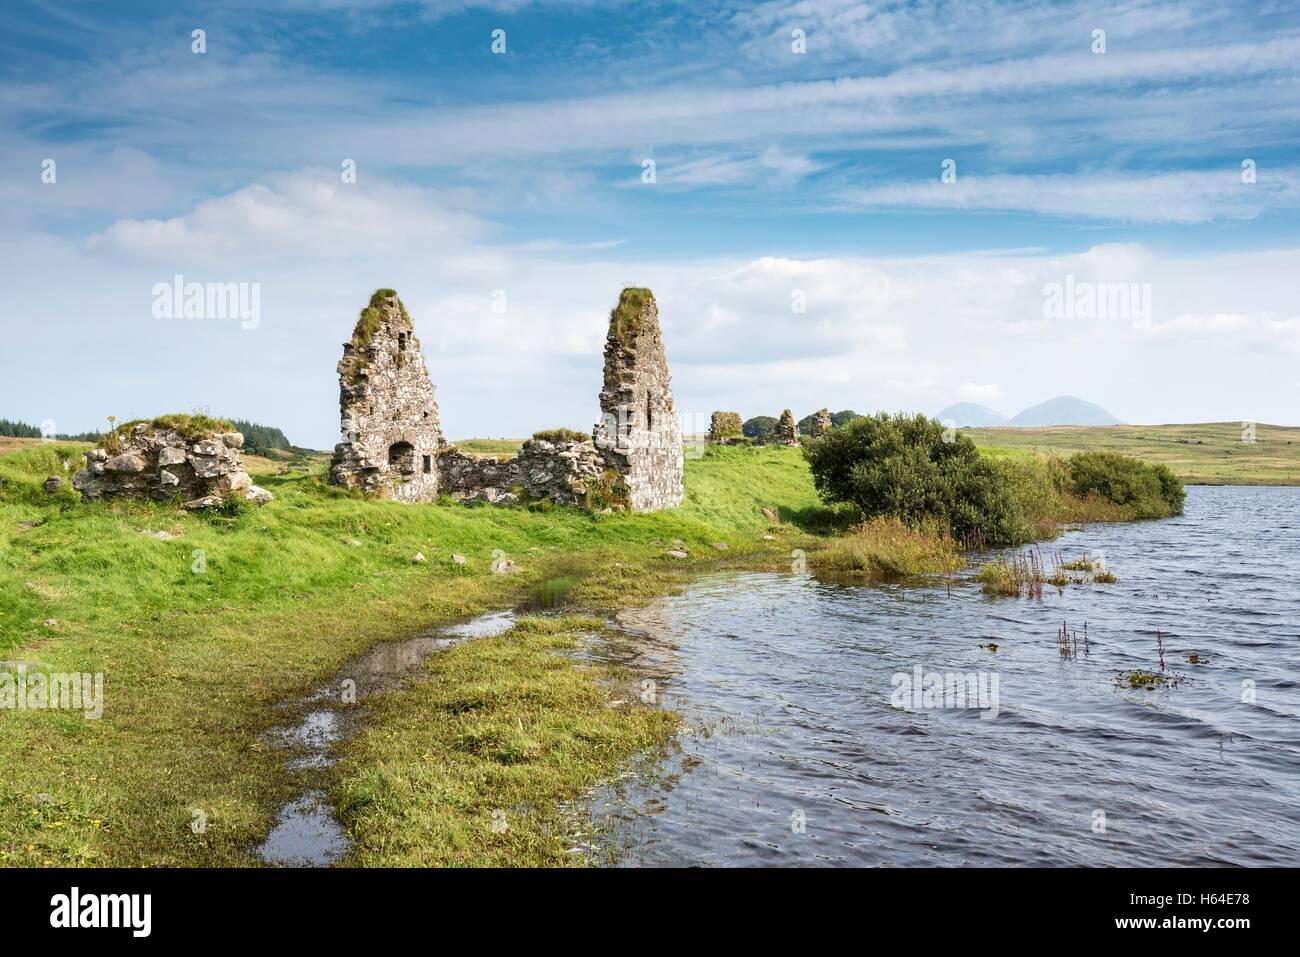 United Kingdom, Scotland, Inner Hebrides, Isle of Islay, Finlaggan Castle on island of Eilean Mor Stock Photo